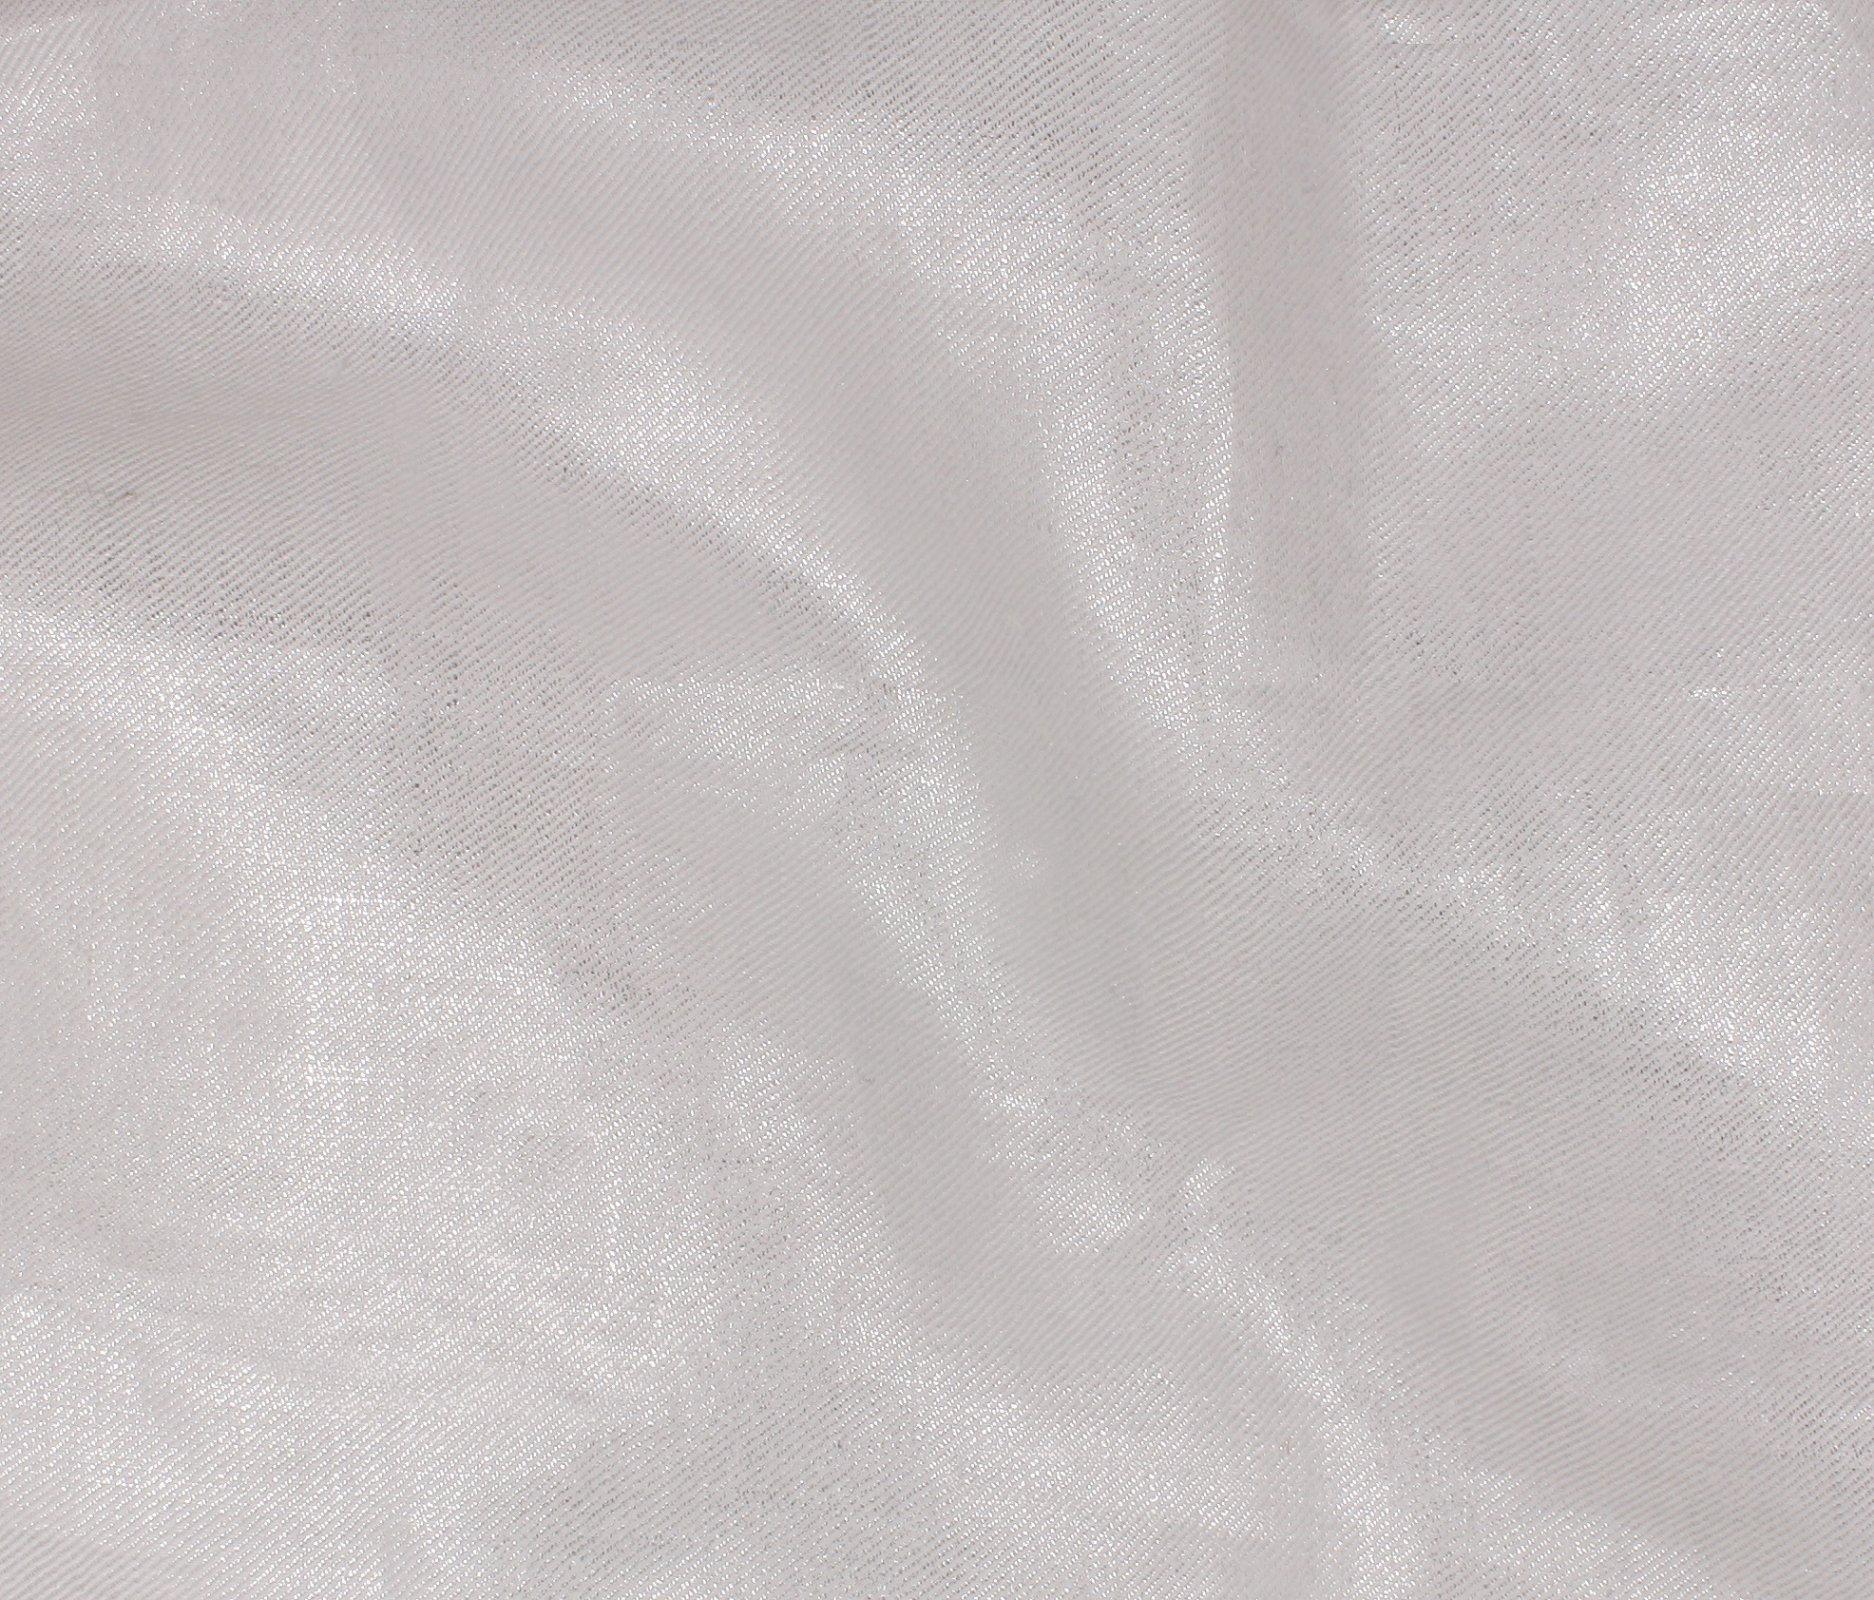 Azure Shine Linen - White/Silver